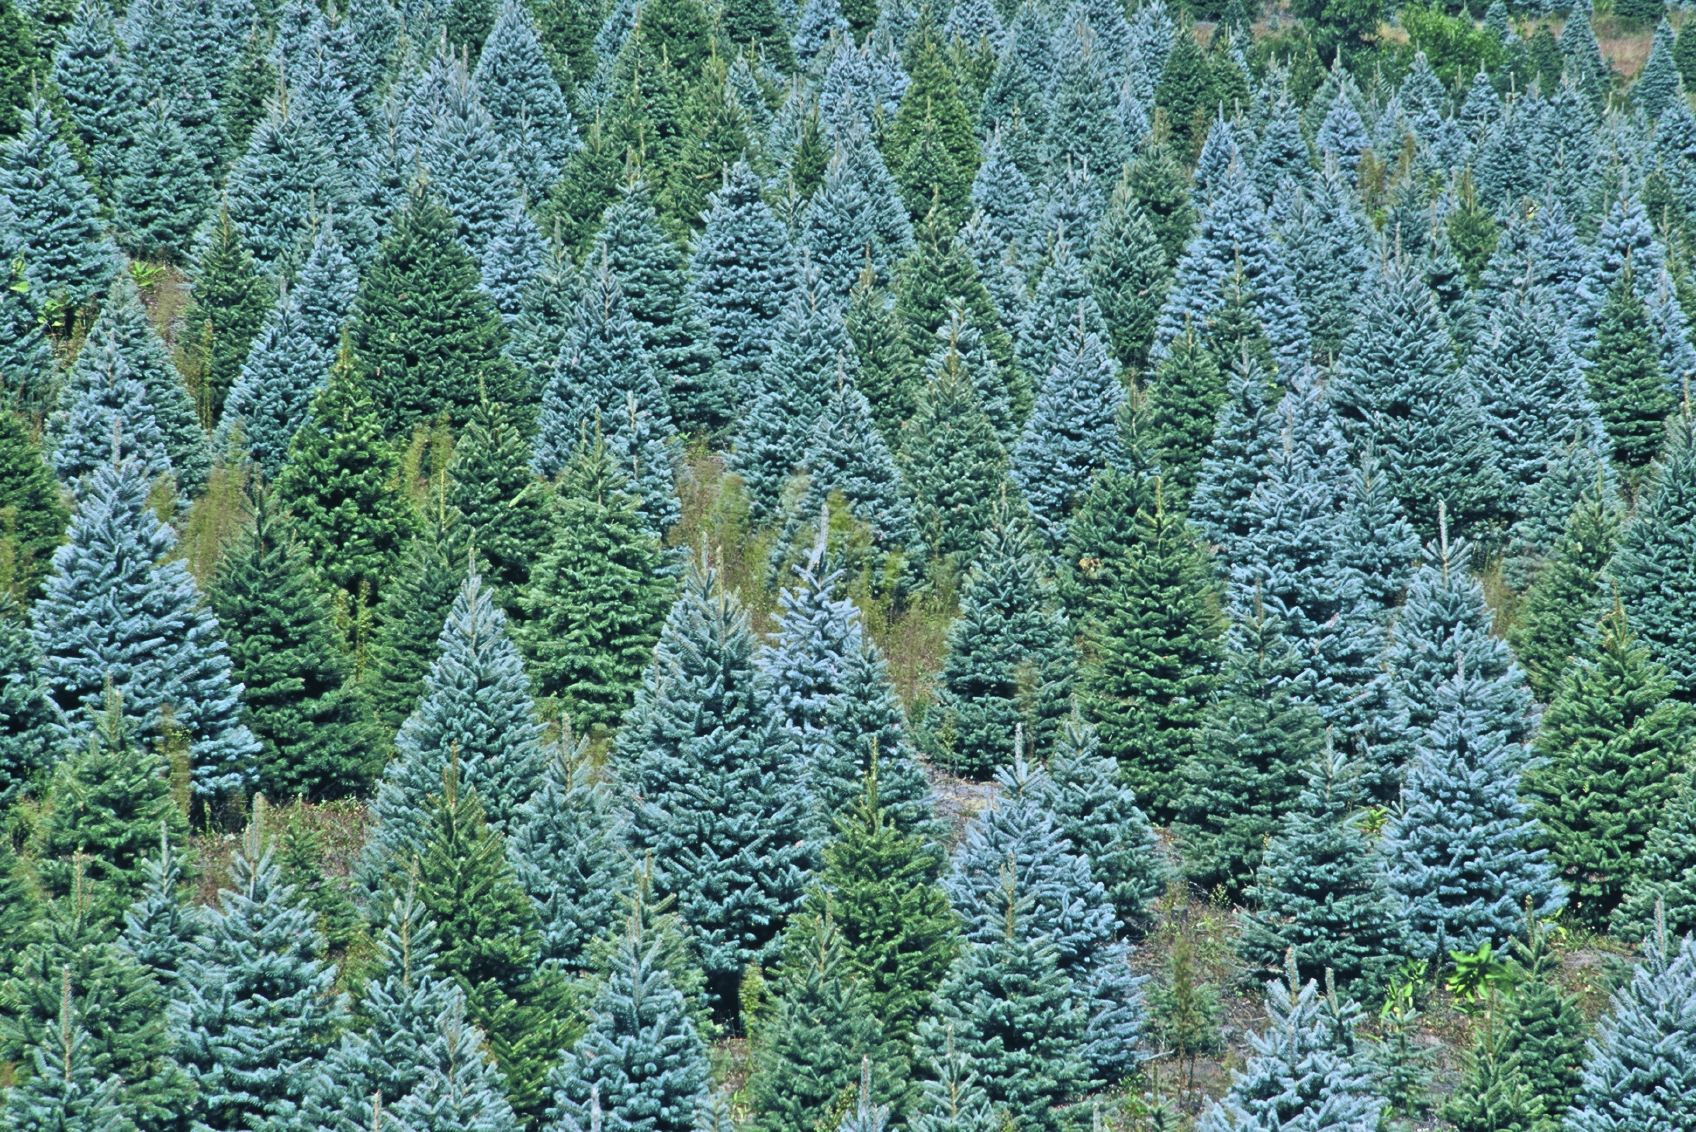 11 Cut-your-own Christmas Tree Farms In Loudoun